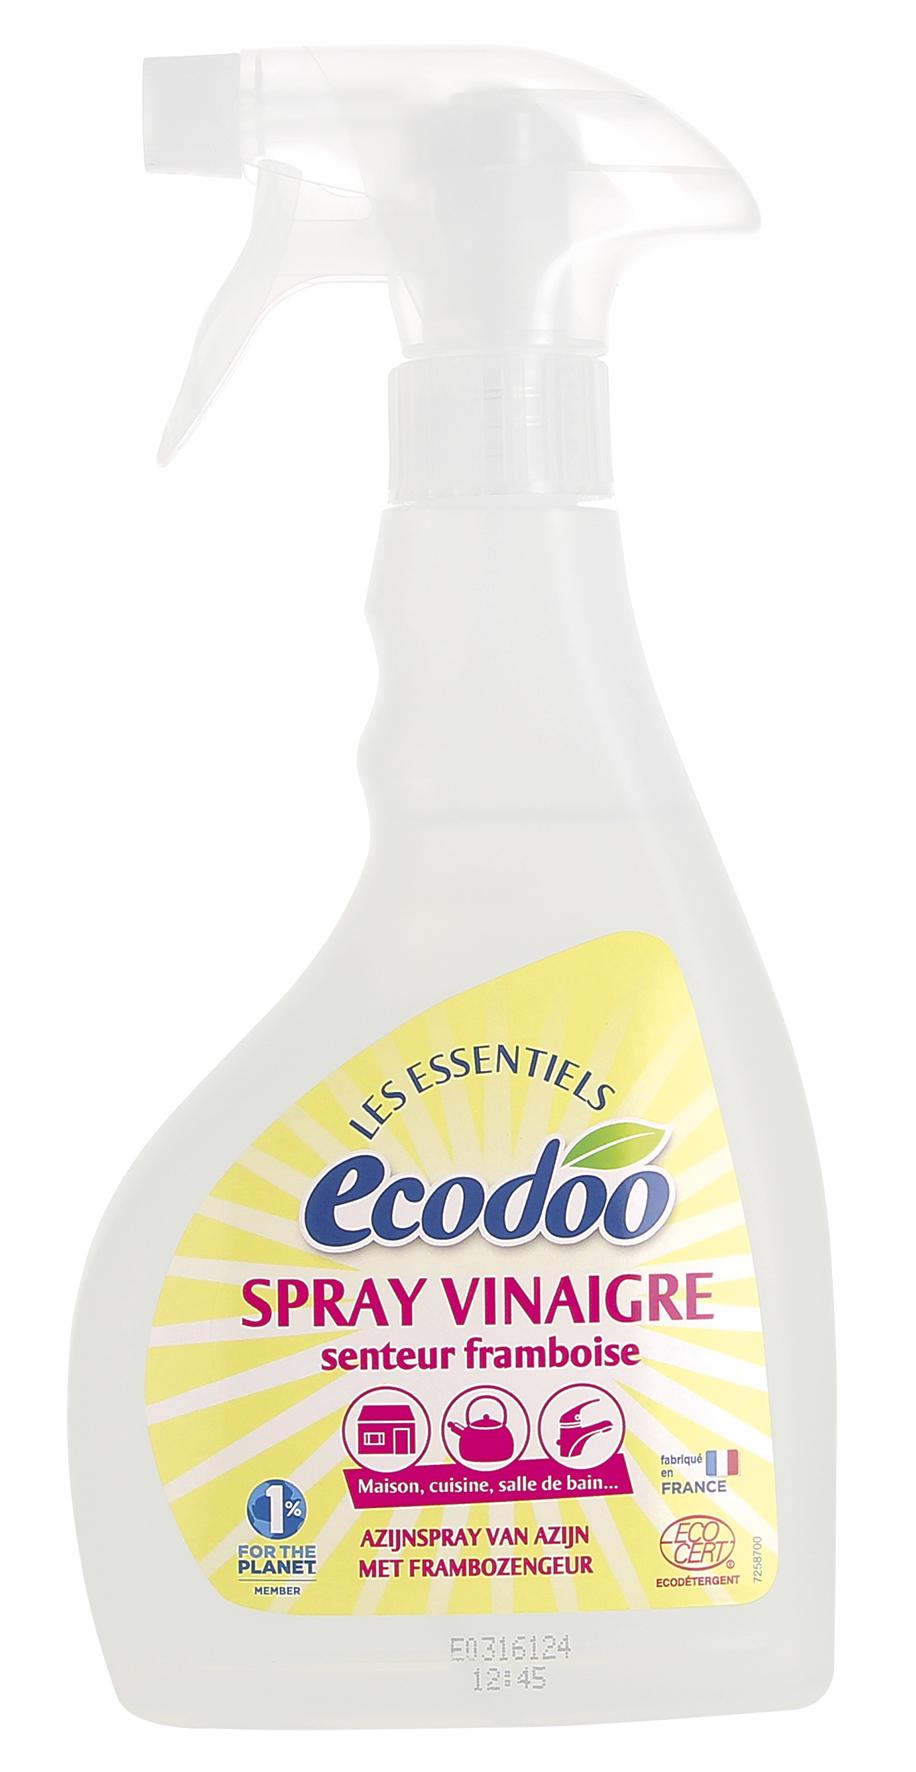 Nettoyant au vinaigre de framboise en spray, Ecodoo (500 ml)